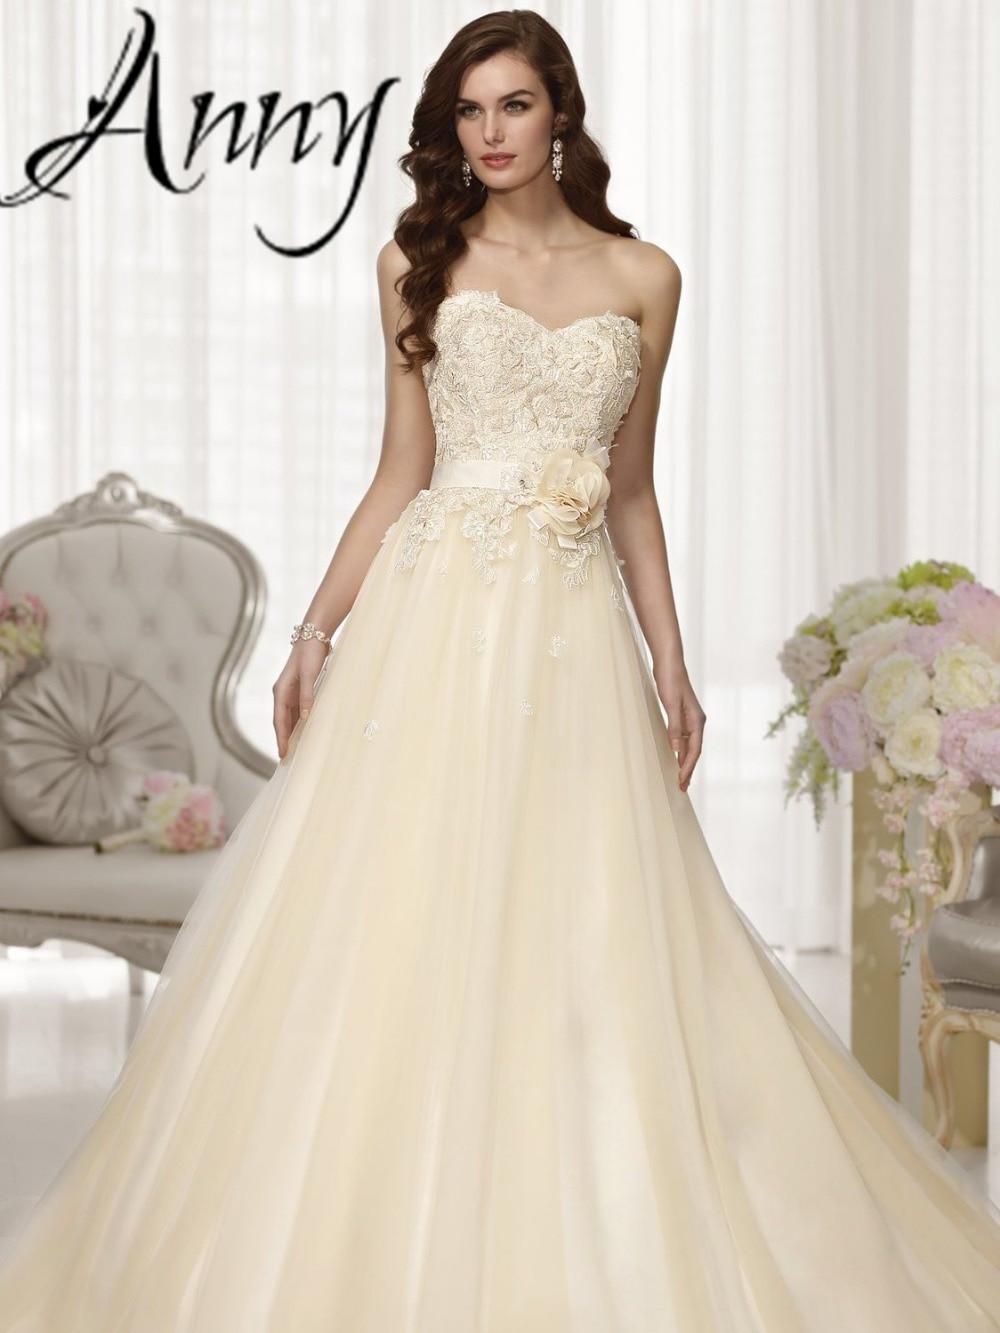 nice new trends wallpapers wedding dresses free hd download nice dresses for wedding nice new trends wallpapers wedding dresses free hd